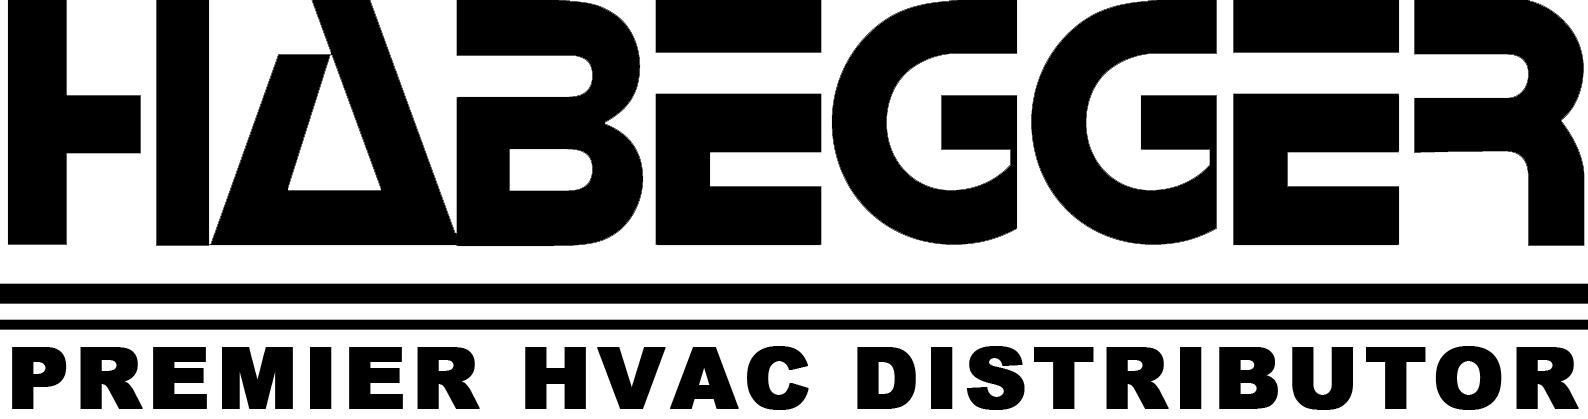 Image result for habegger logo